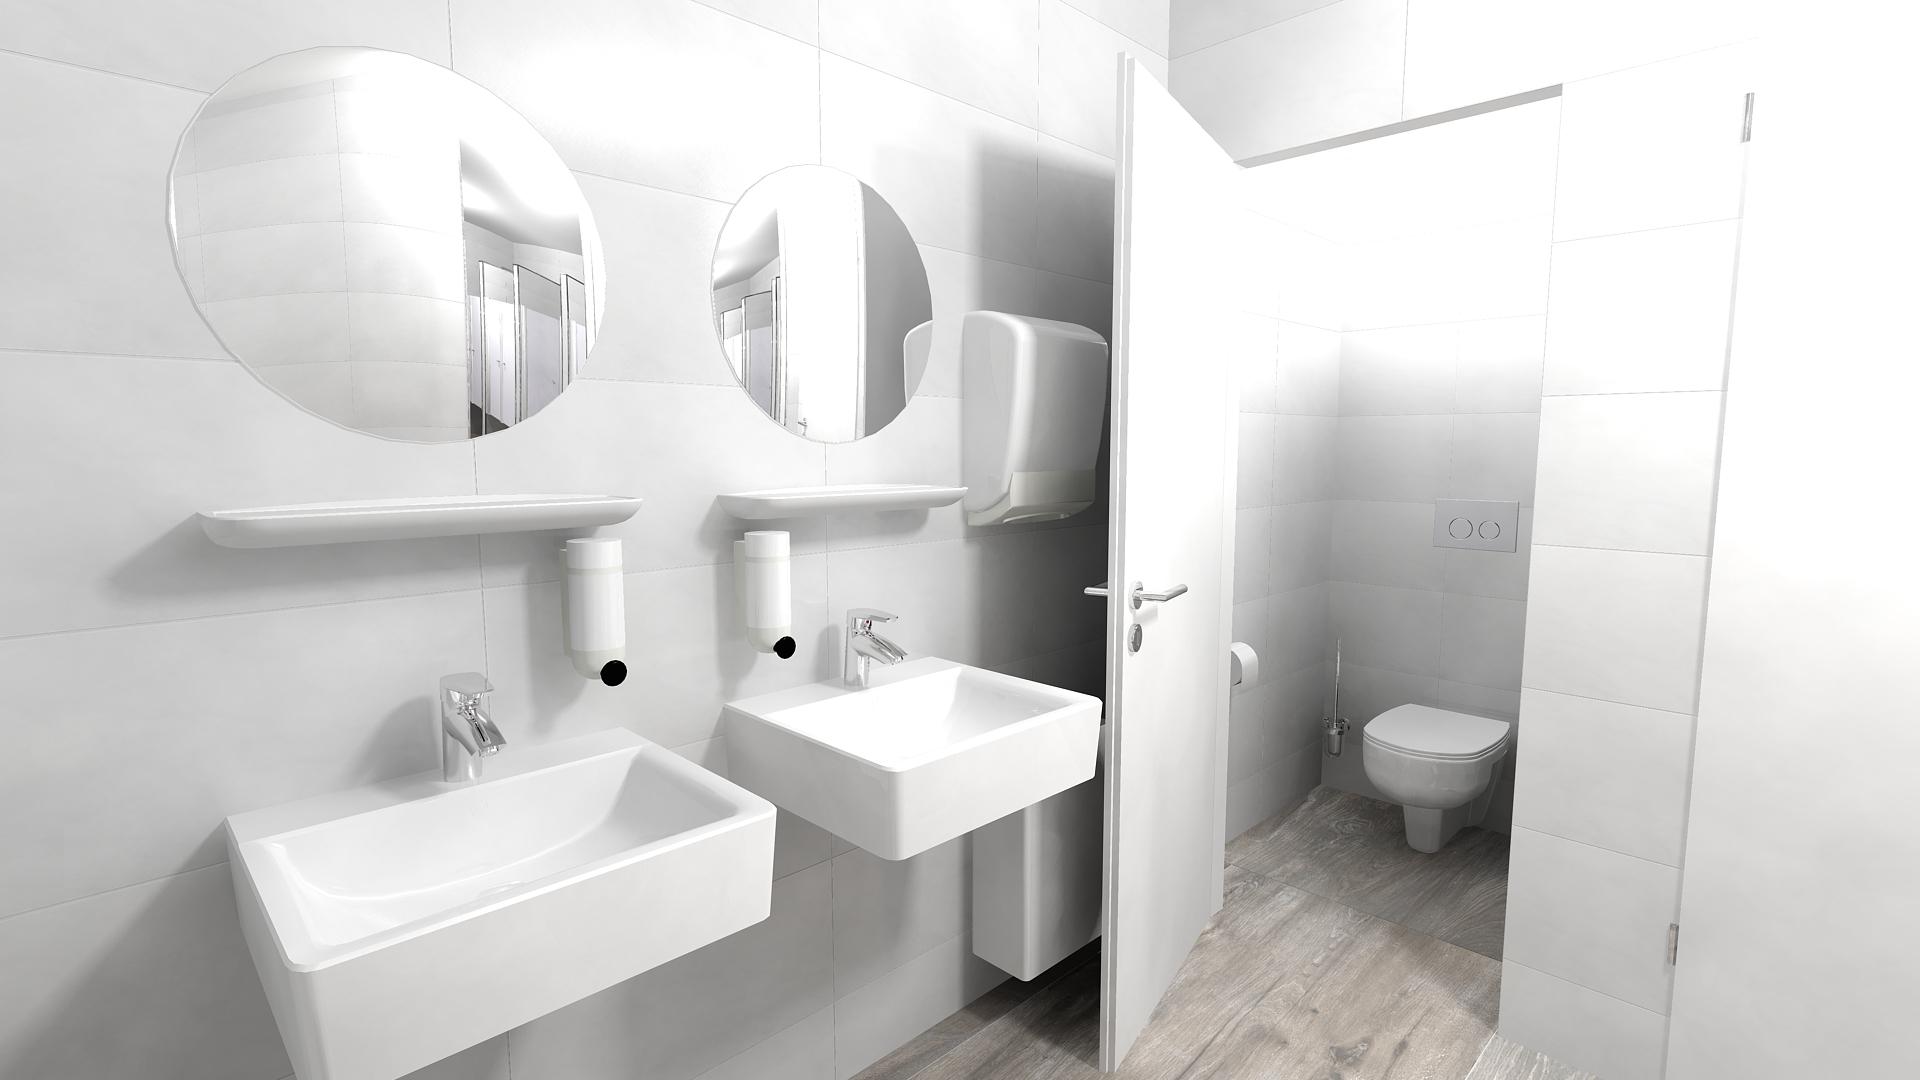 Damen WC Fitness Studio01 PublicArea By Gerd Nolte Inh.R.Schumann ...